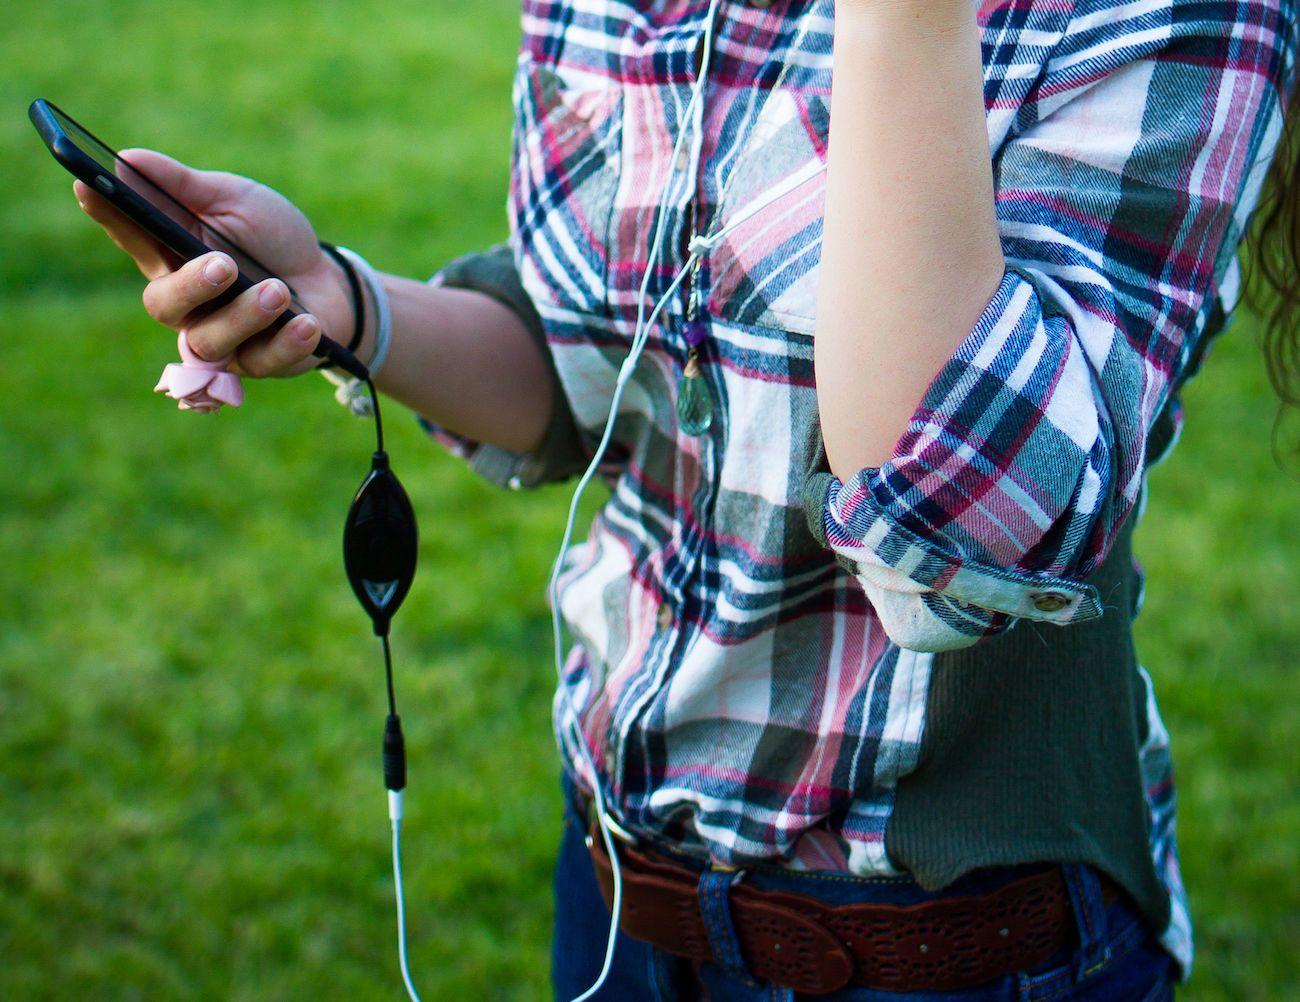 SoundBrake 2.0 Headphones Awareness Device